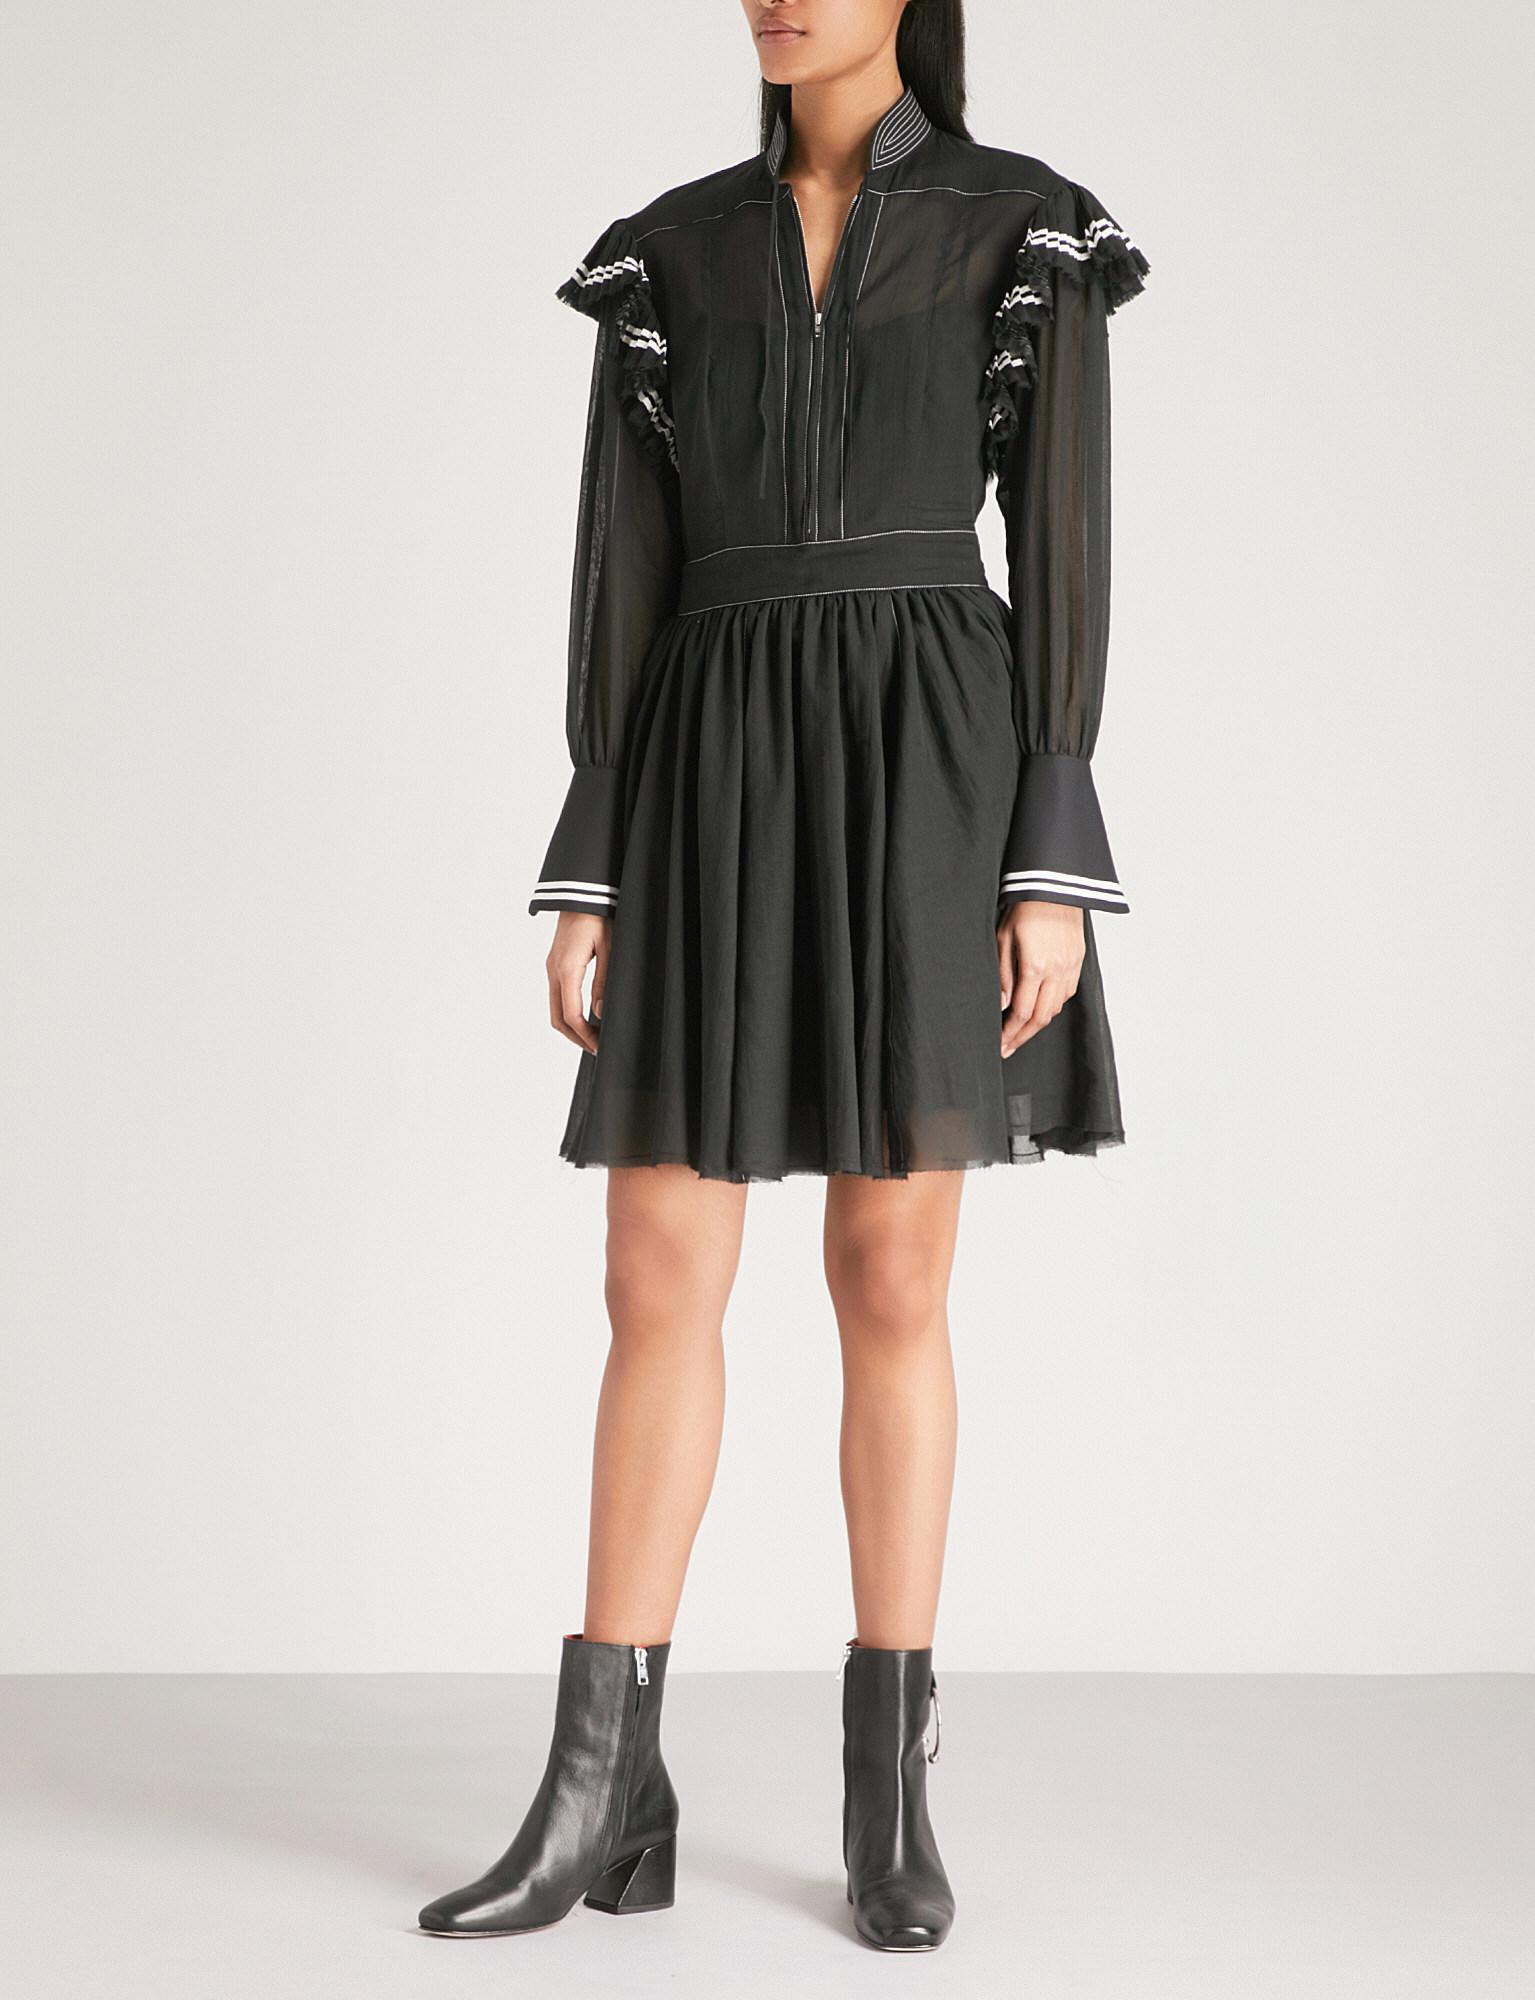 Frilled mini cotton dress Philosophy di Lorenzo Serafini 5Y501N7pZ